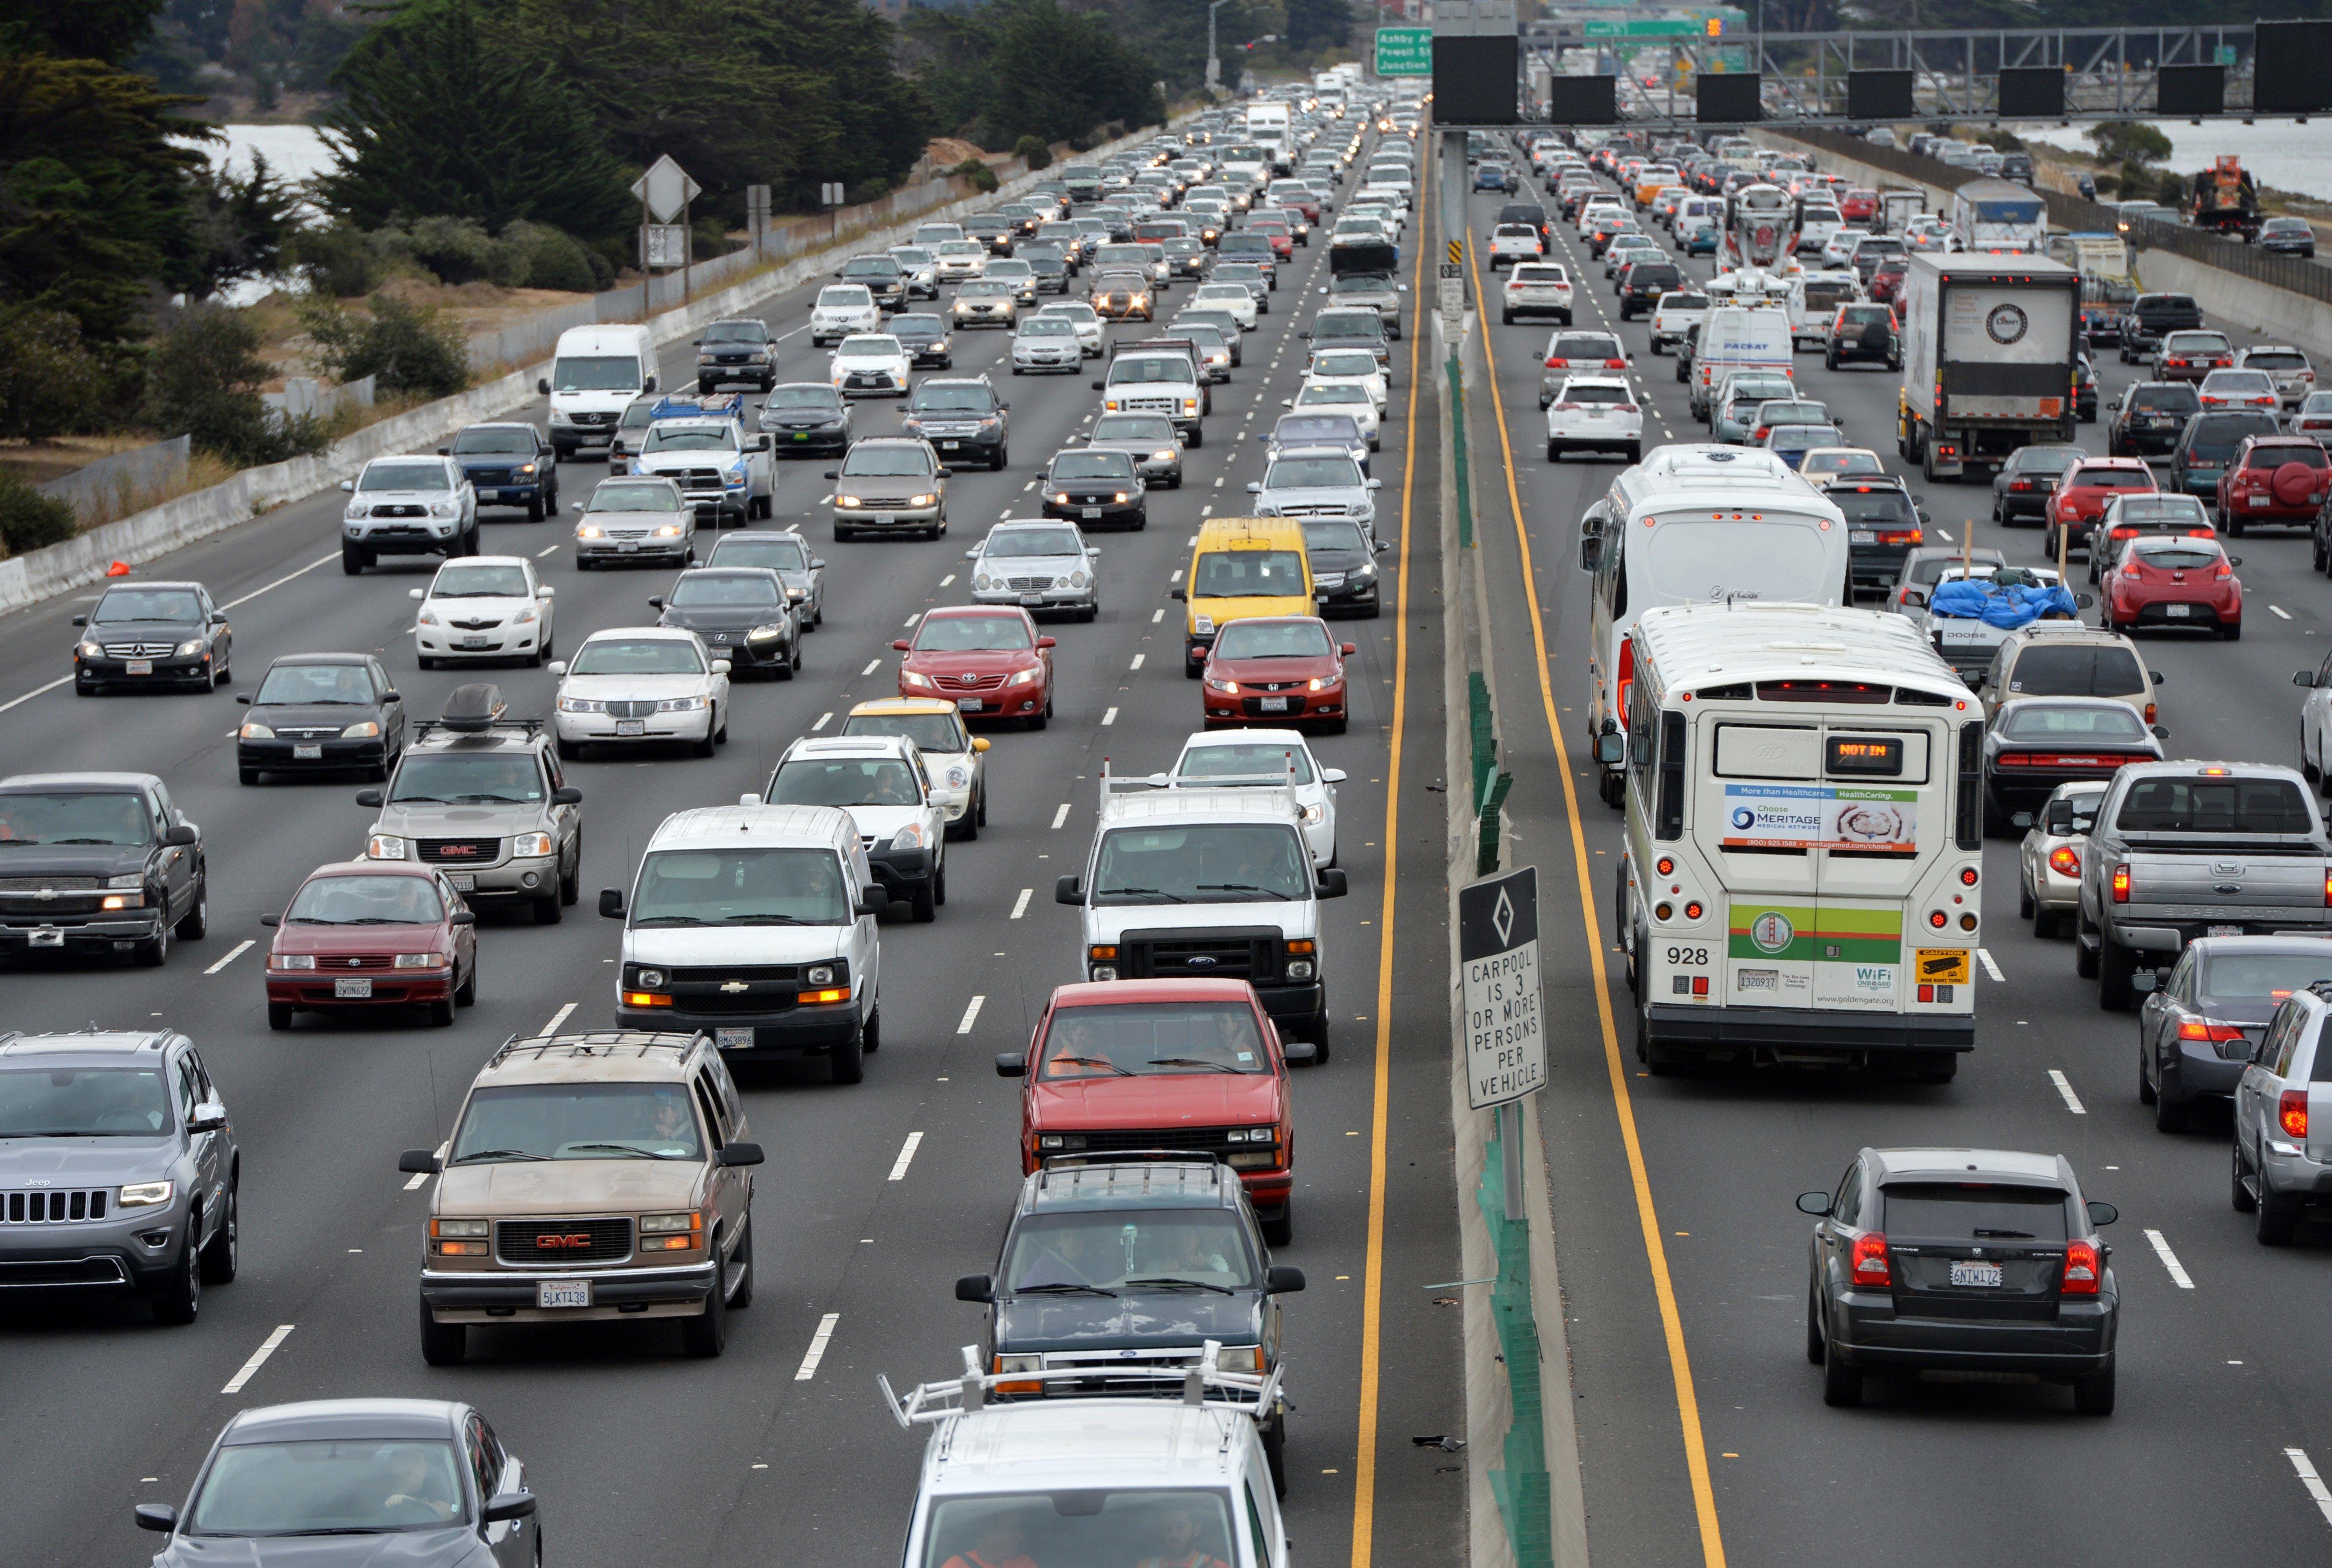 Bay Areas 10 worst commutes unveiled Bay Bridge San Joses 680